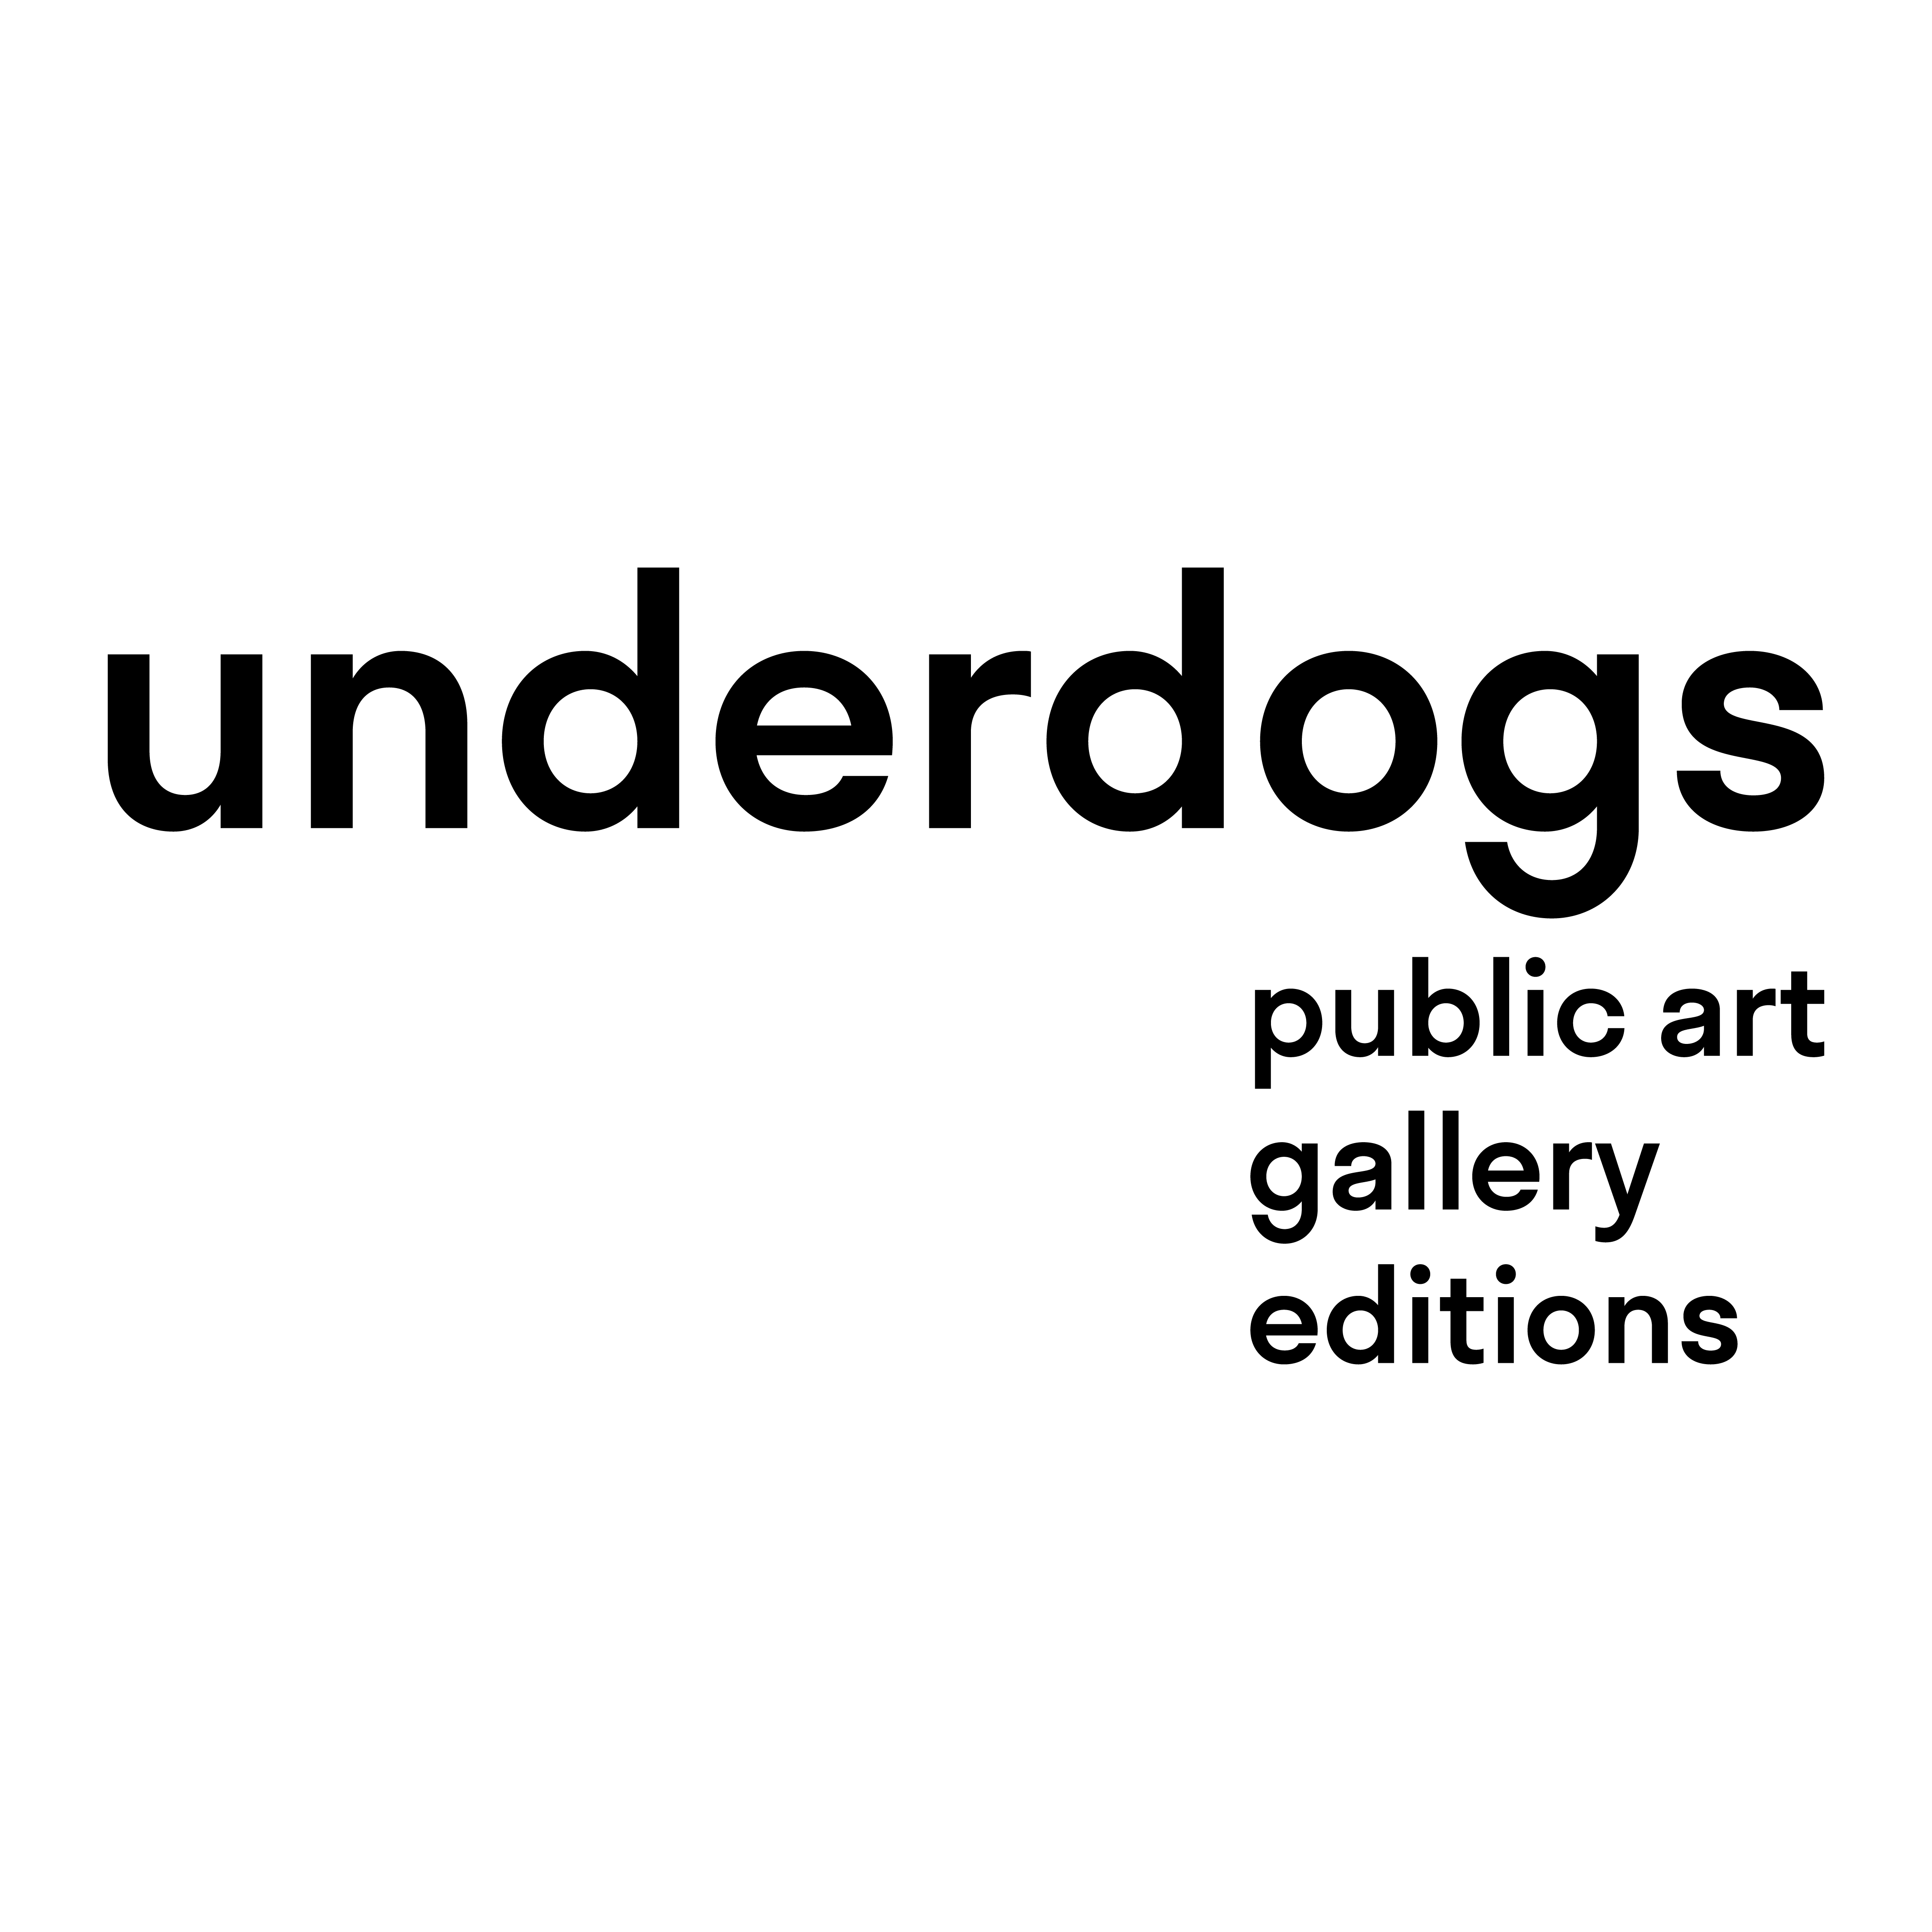 Underdogs Gallery